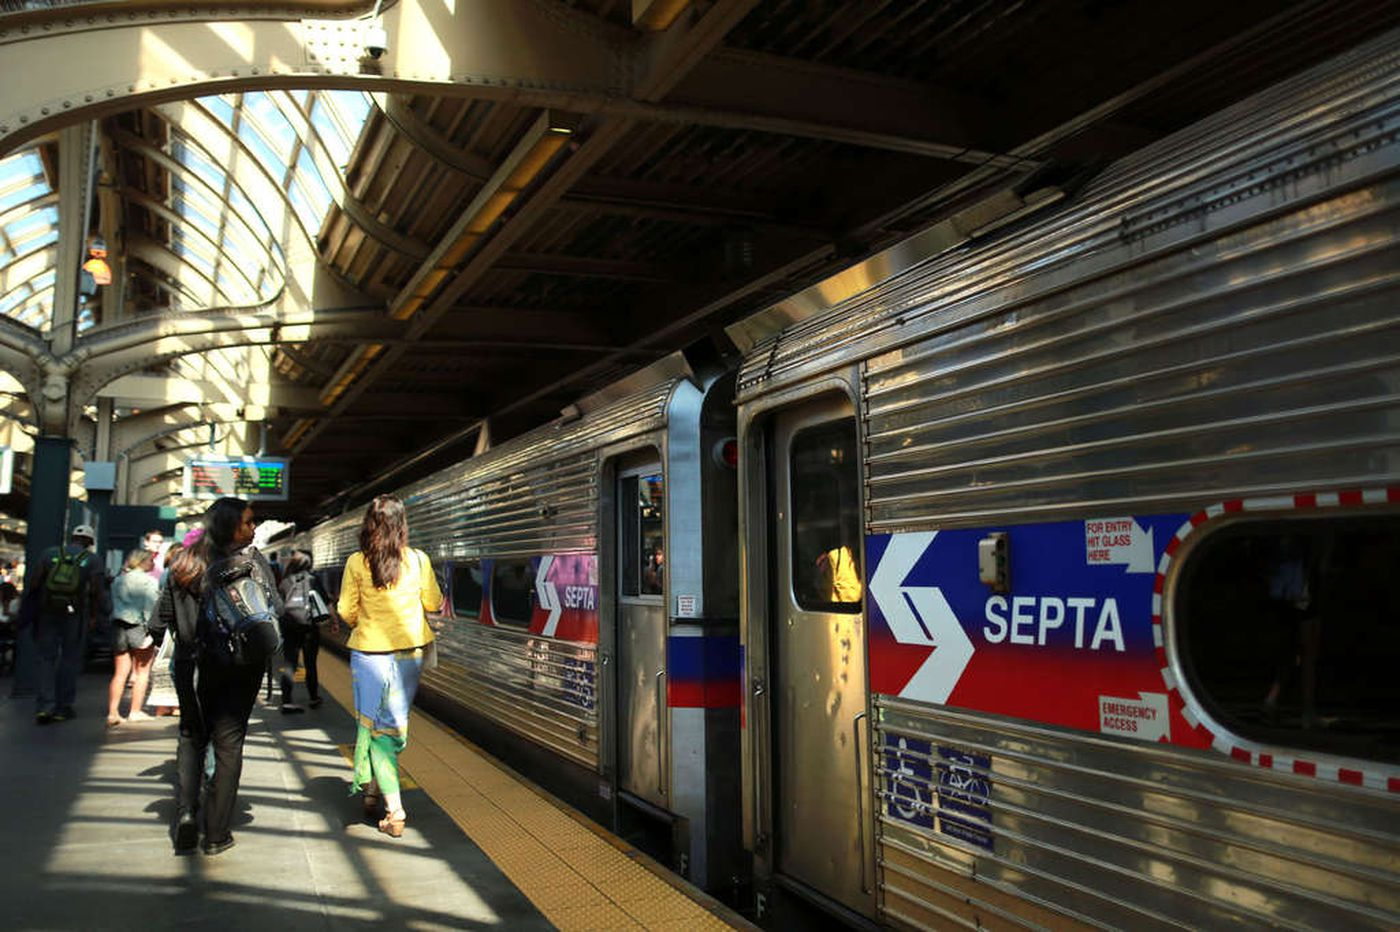 Ticket taking, Key card scanning: Coronavirus prompts SEPTA to reinforce best practices on Regional Rail